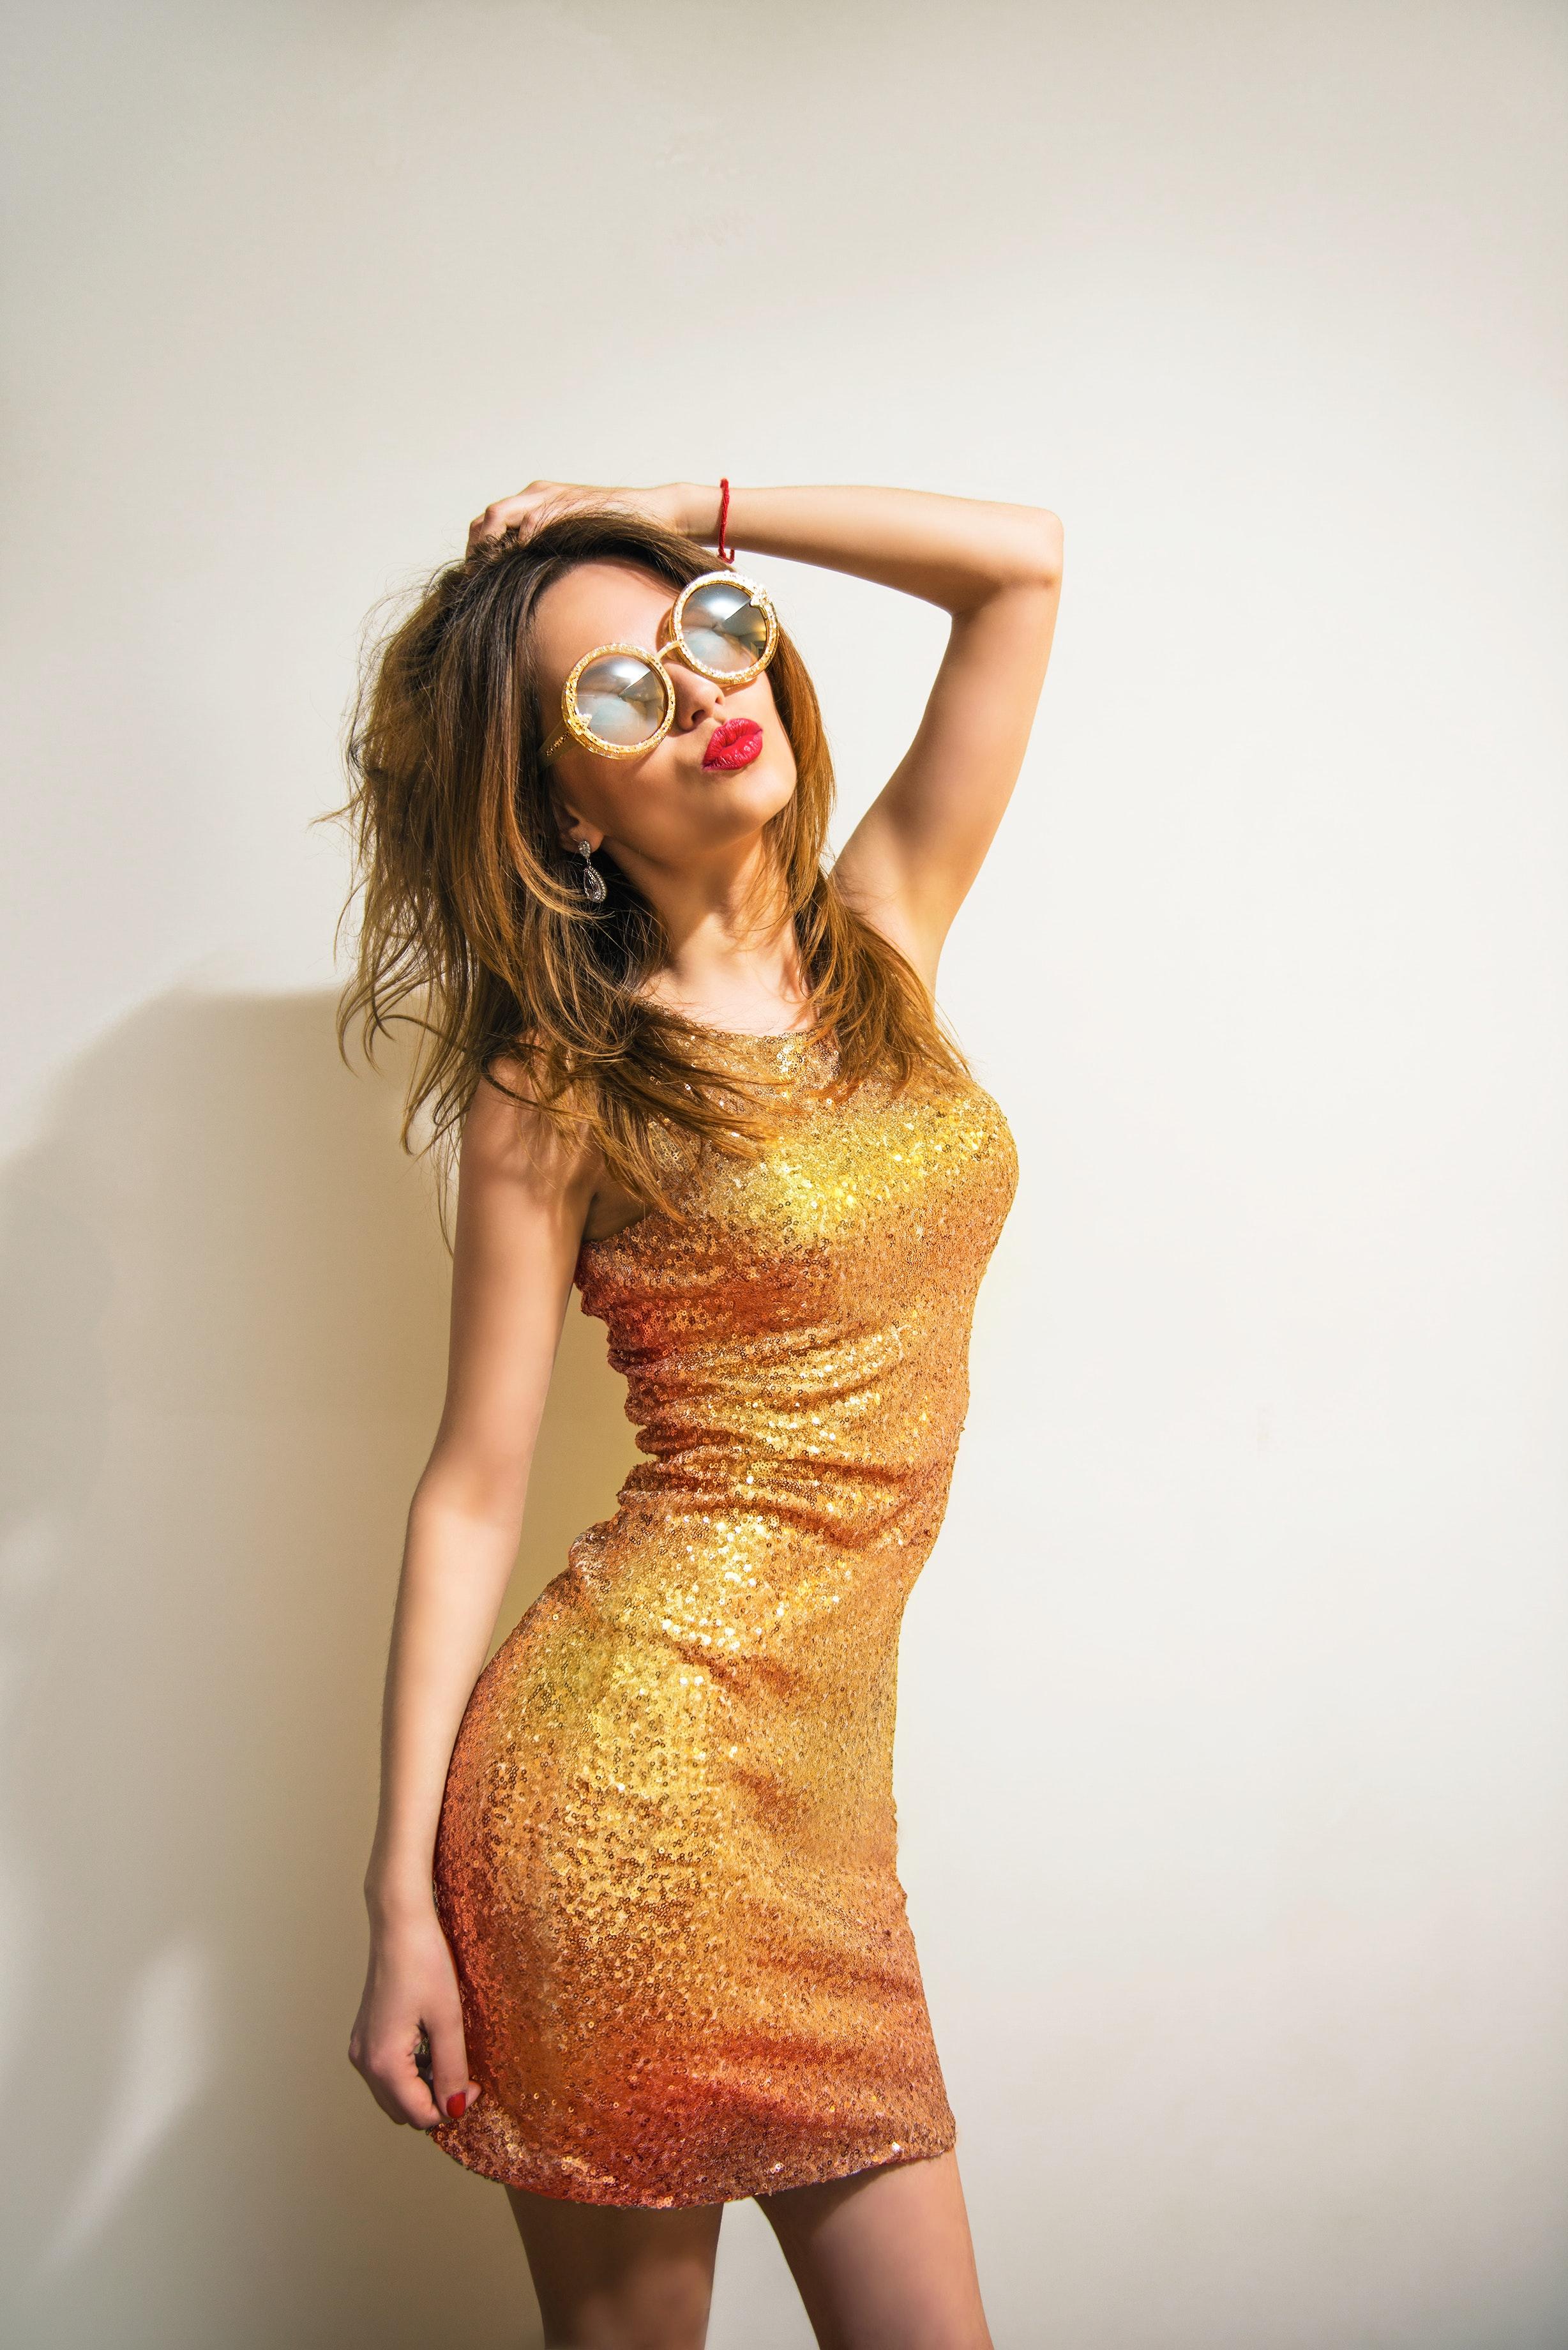 Paparazzi Andrea Yurko  nudes (49 foto), Instagram, lingerie